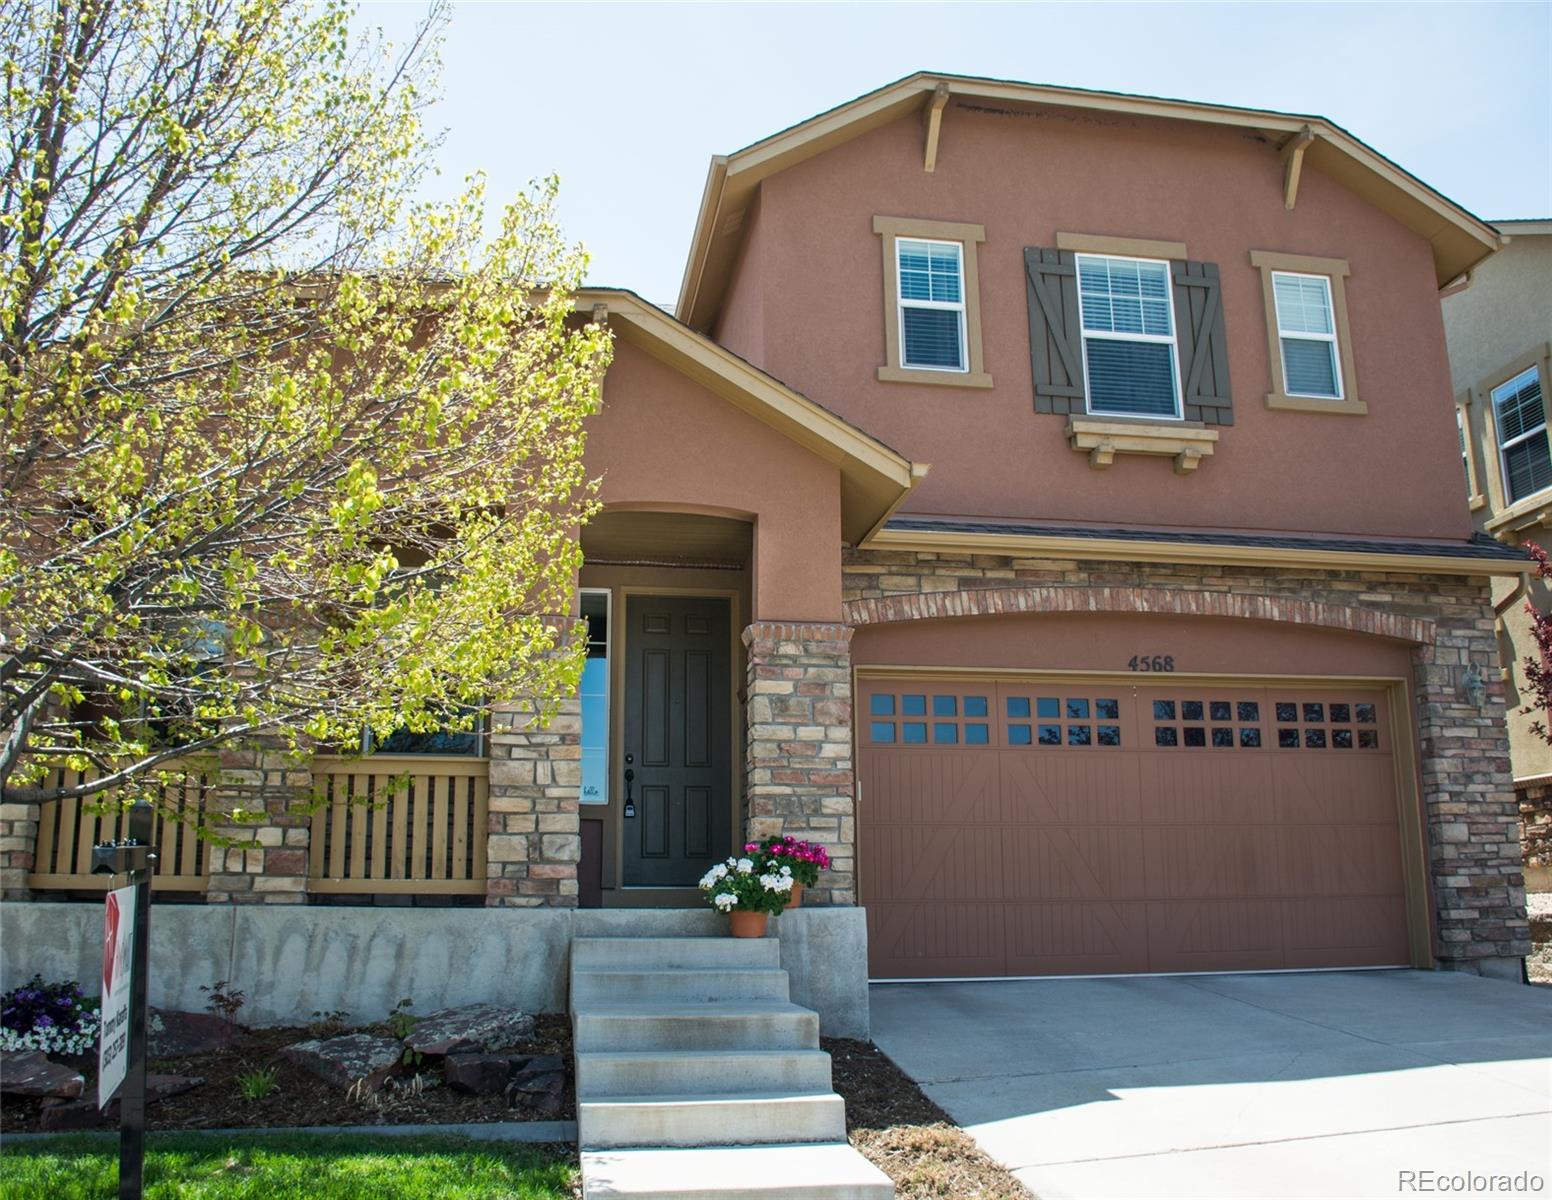 MLS# 6747511 - 28 - 4568 Valleybrook Drive, Highlands Ranch, CO 80130